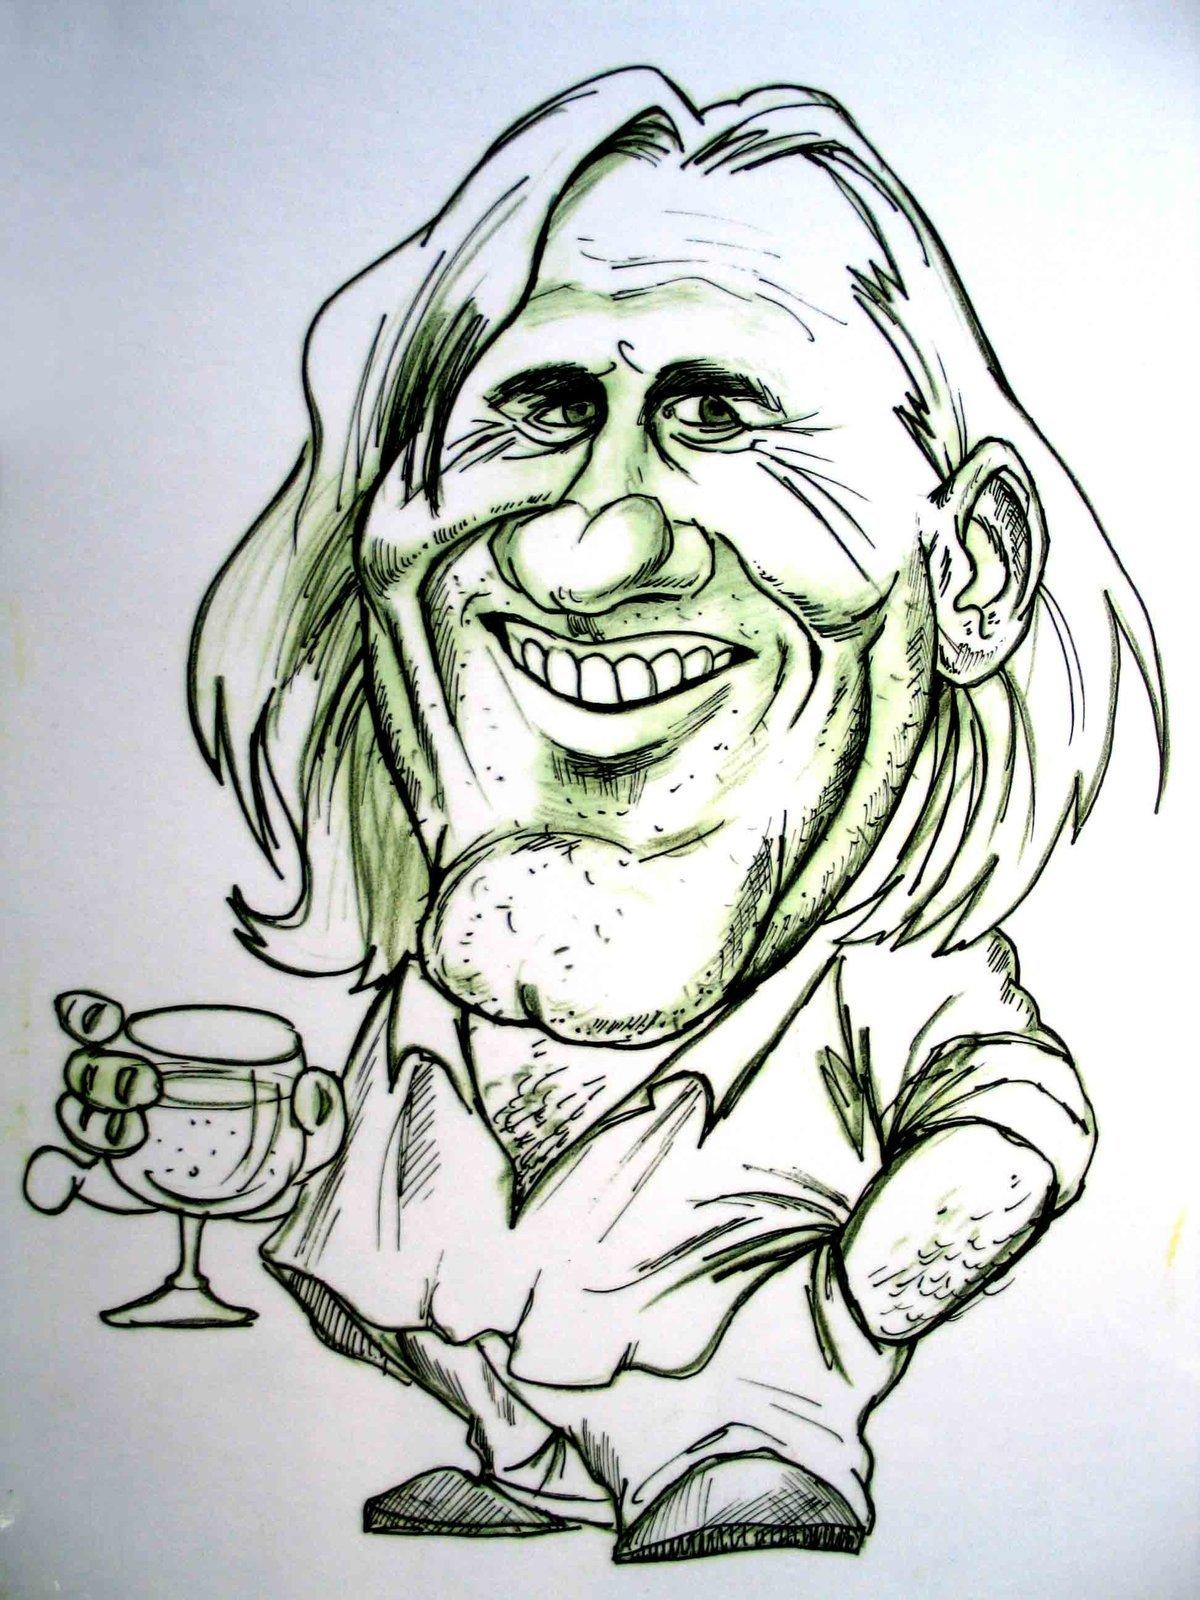 рисунки мужчин карандашом смешные сих пор могу